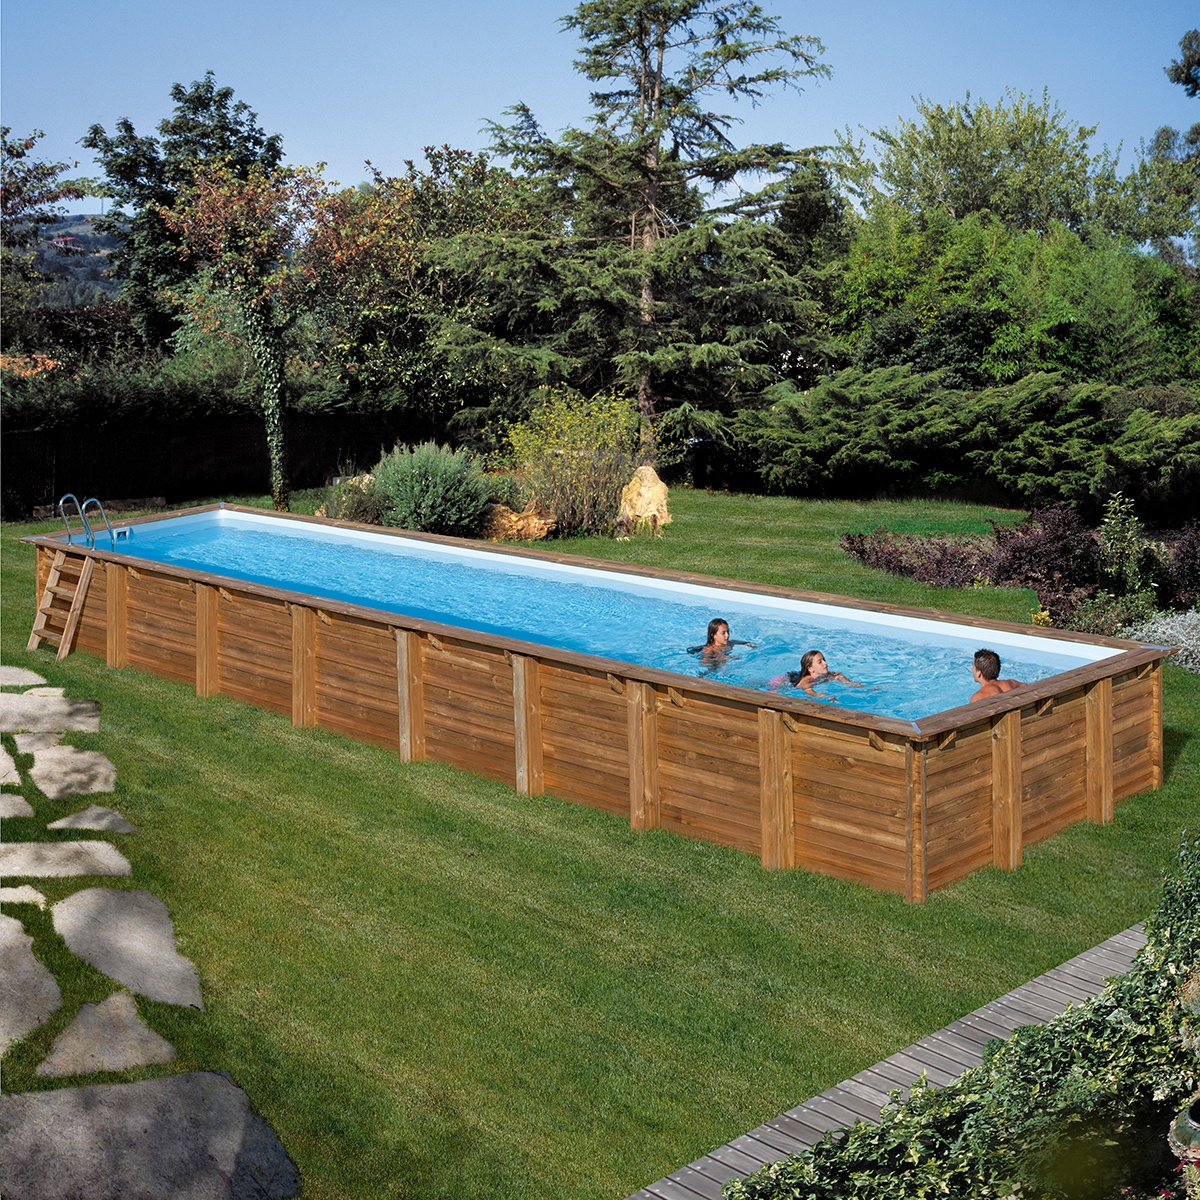 Piscina gre sunbay cardamon 1200x400x146 piscinas desmontables - Piscine fuori terra rettangolari ...